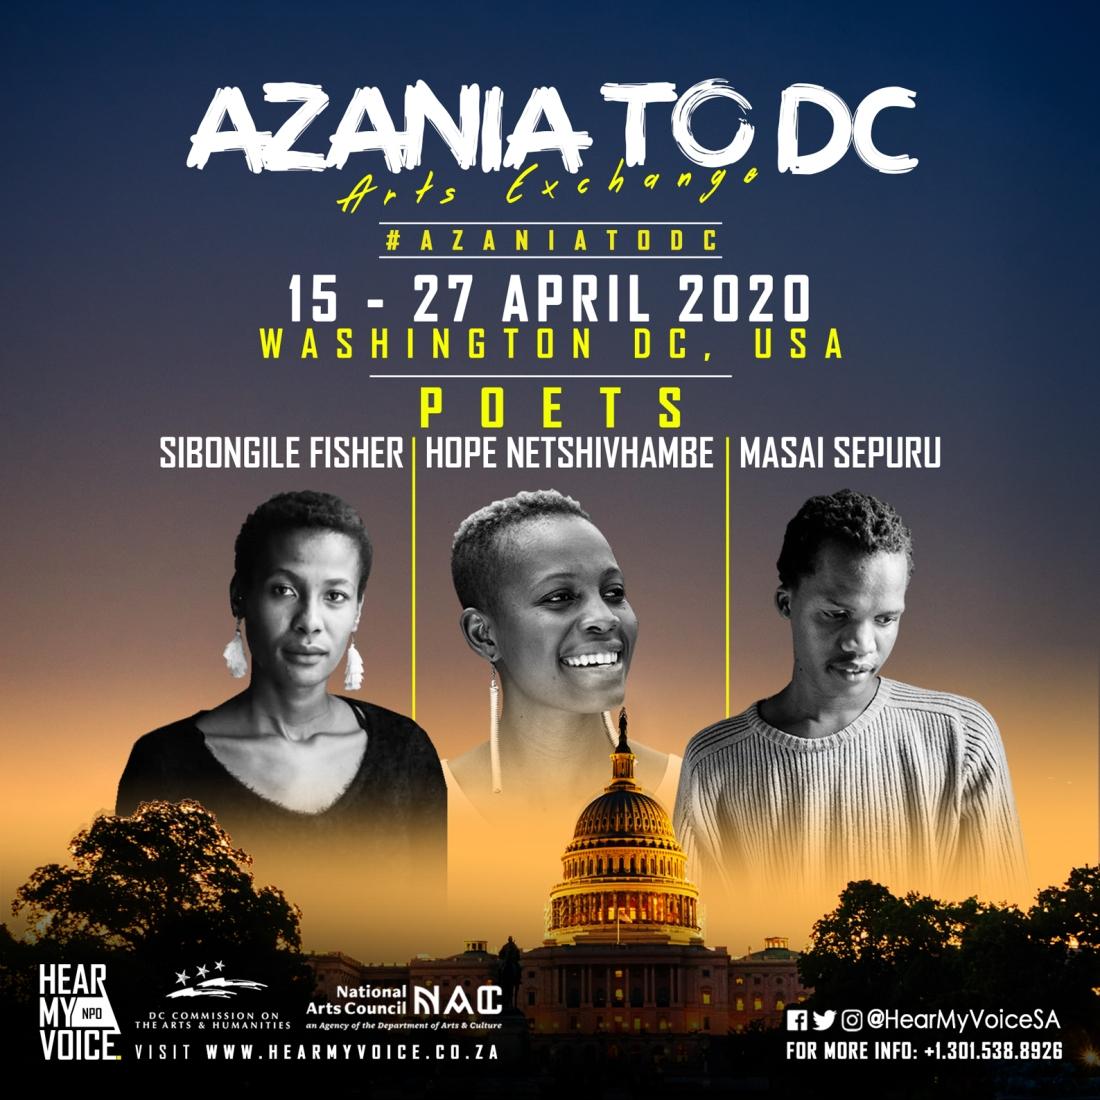 DC_SA-Exchange-AzaniaToDC_Washington